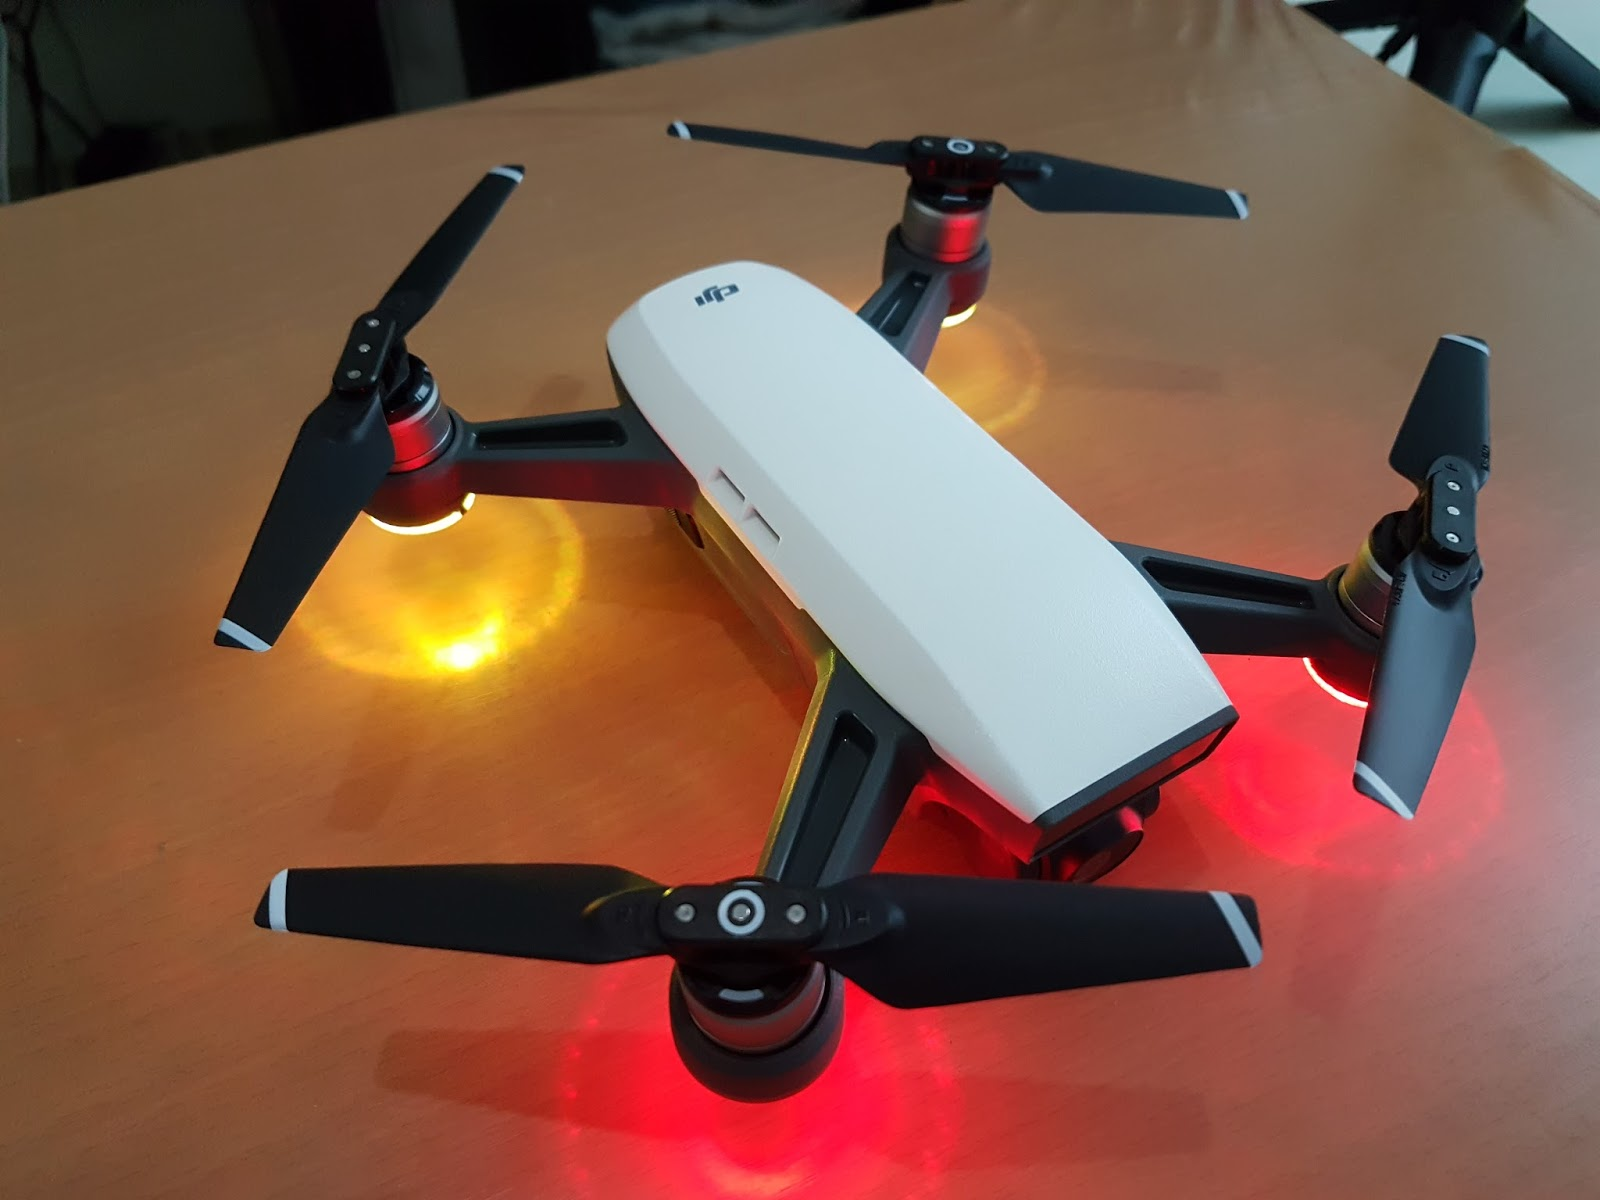 Gadget Review: DJI Spark Drone